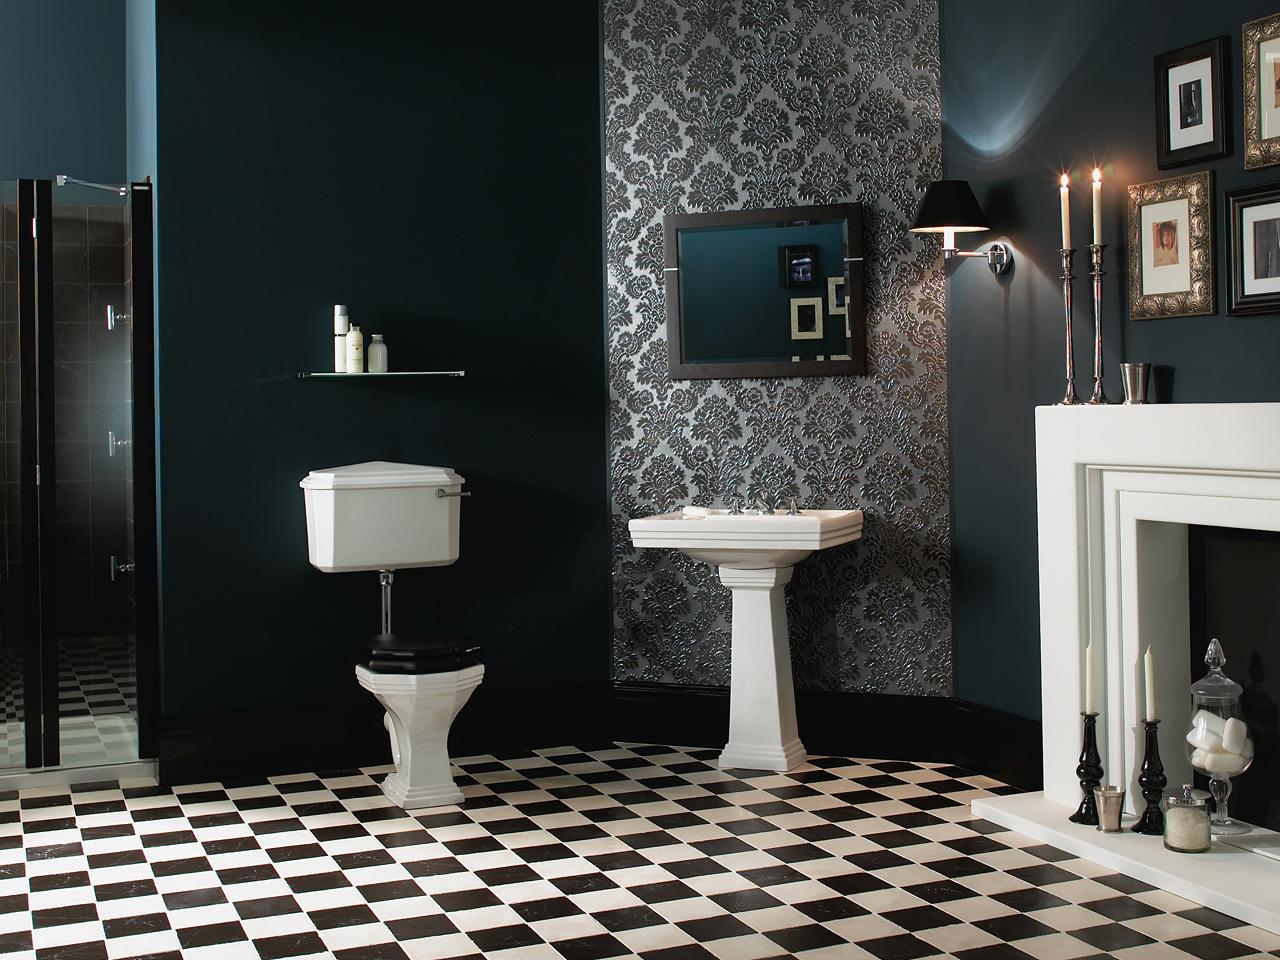 Classic Bathrooms: Imperial Bathrooms - Astoria-main-final